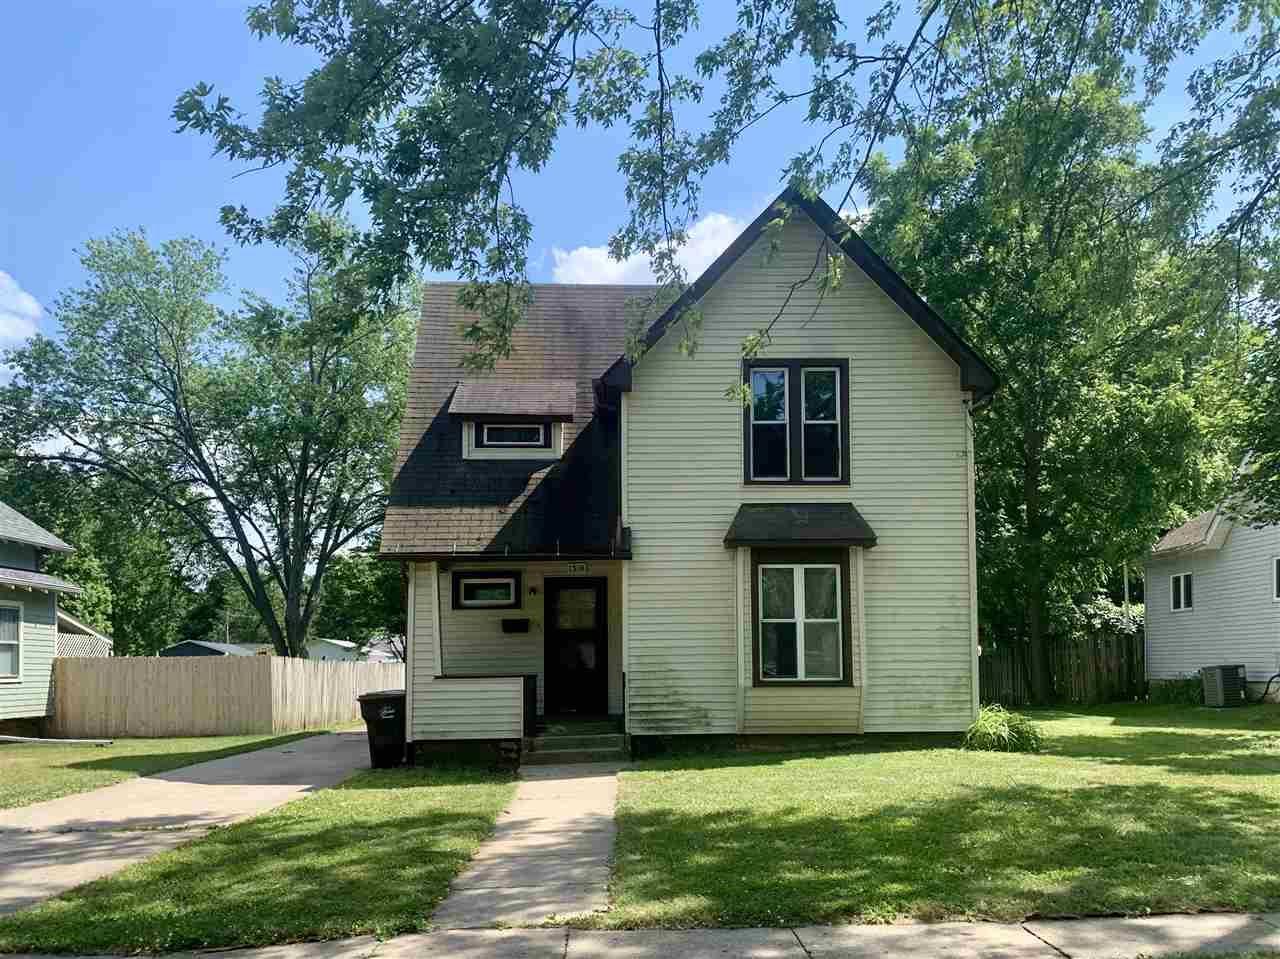 1310 Strong Ave, Beloit, WI 53511-999 - #: 1887138